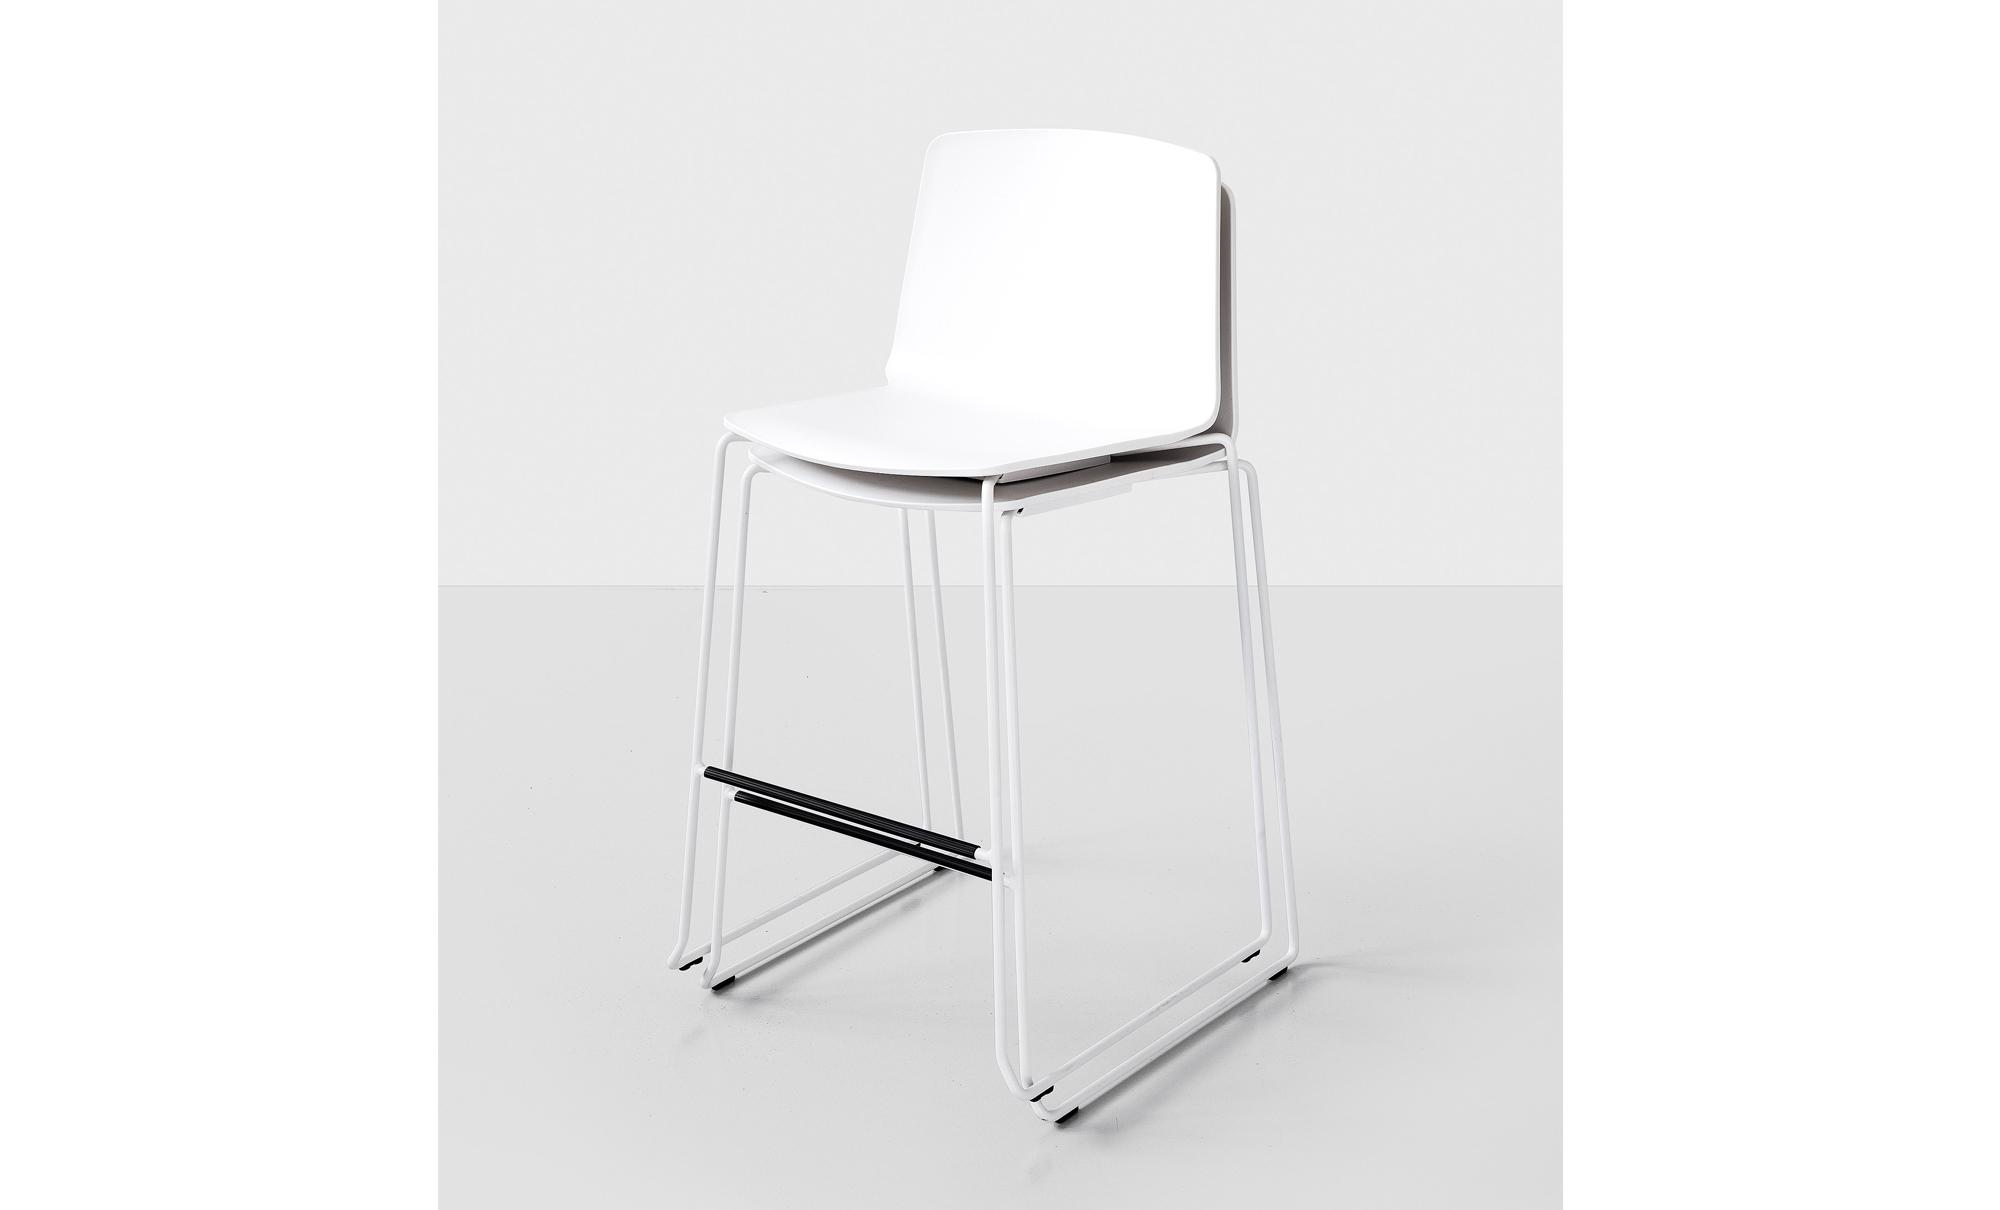 100 kitchen stools sydney furniture designer outdoor stools